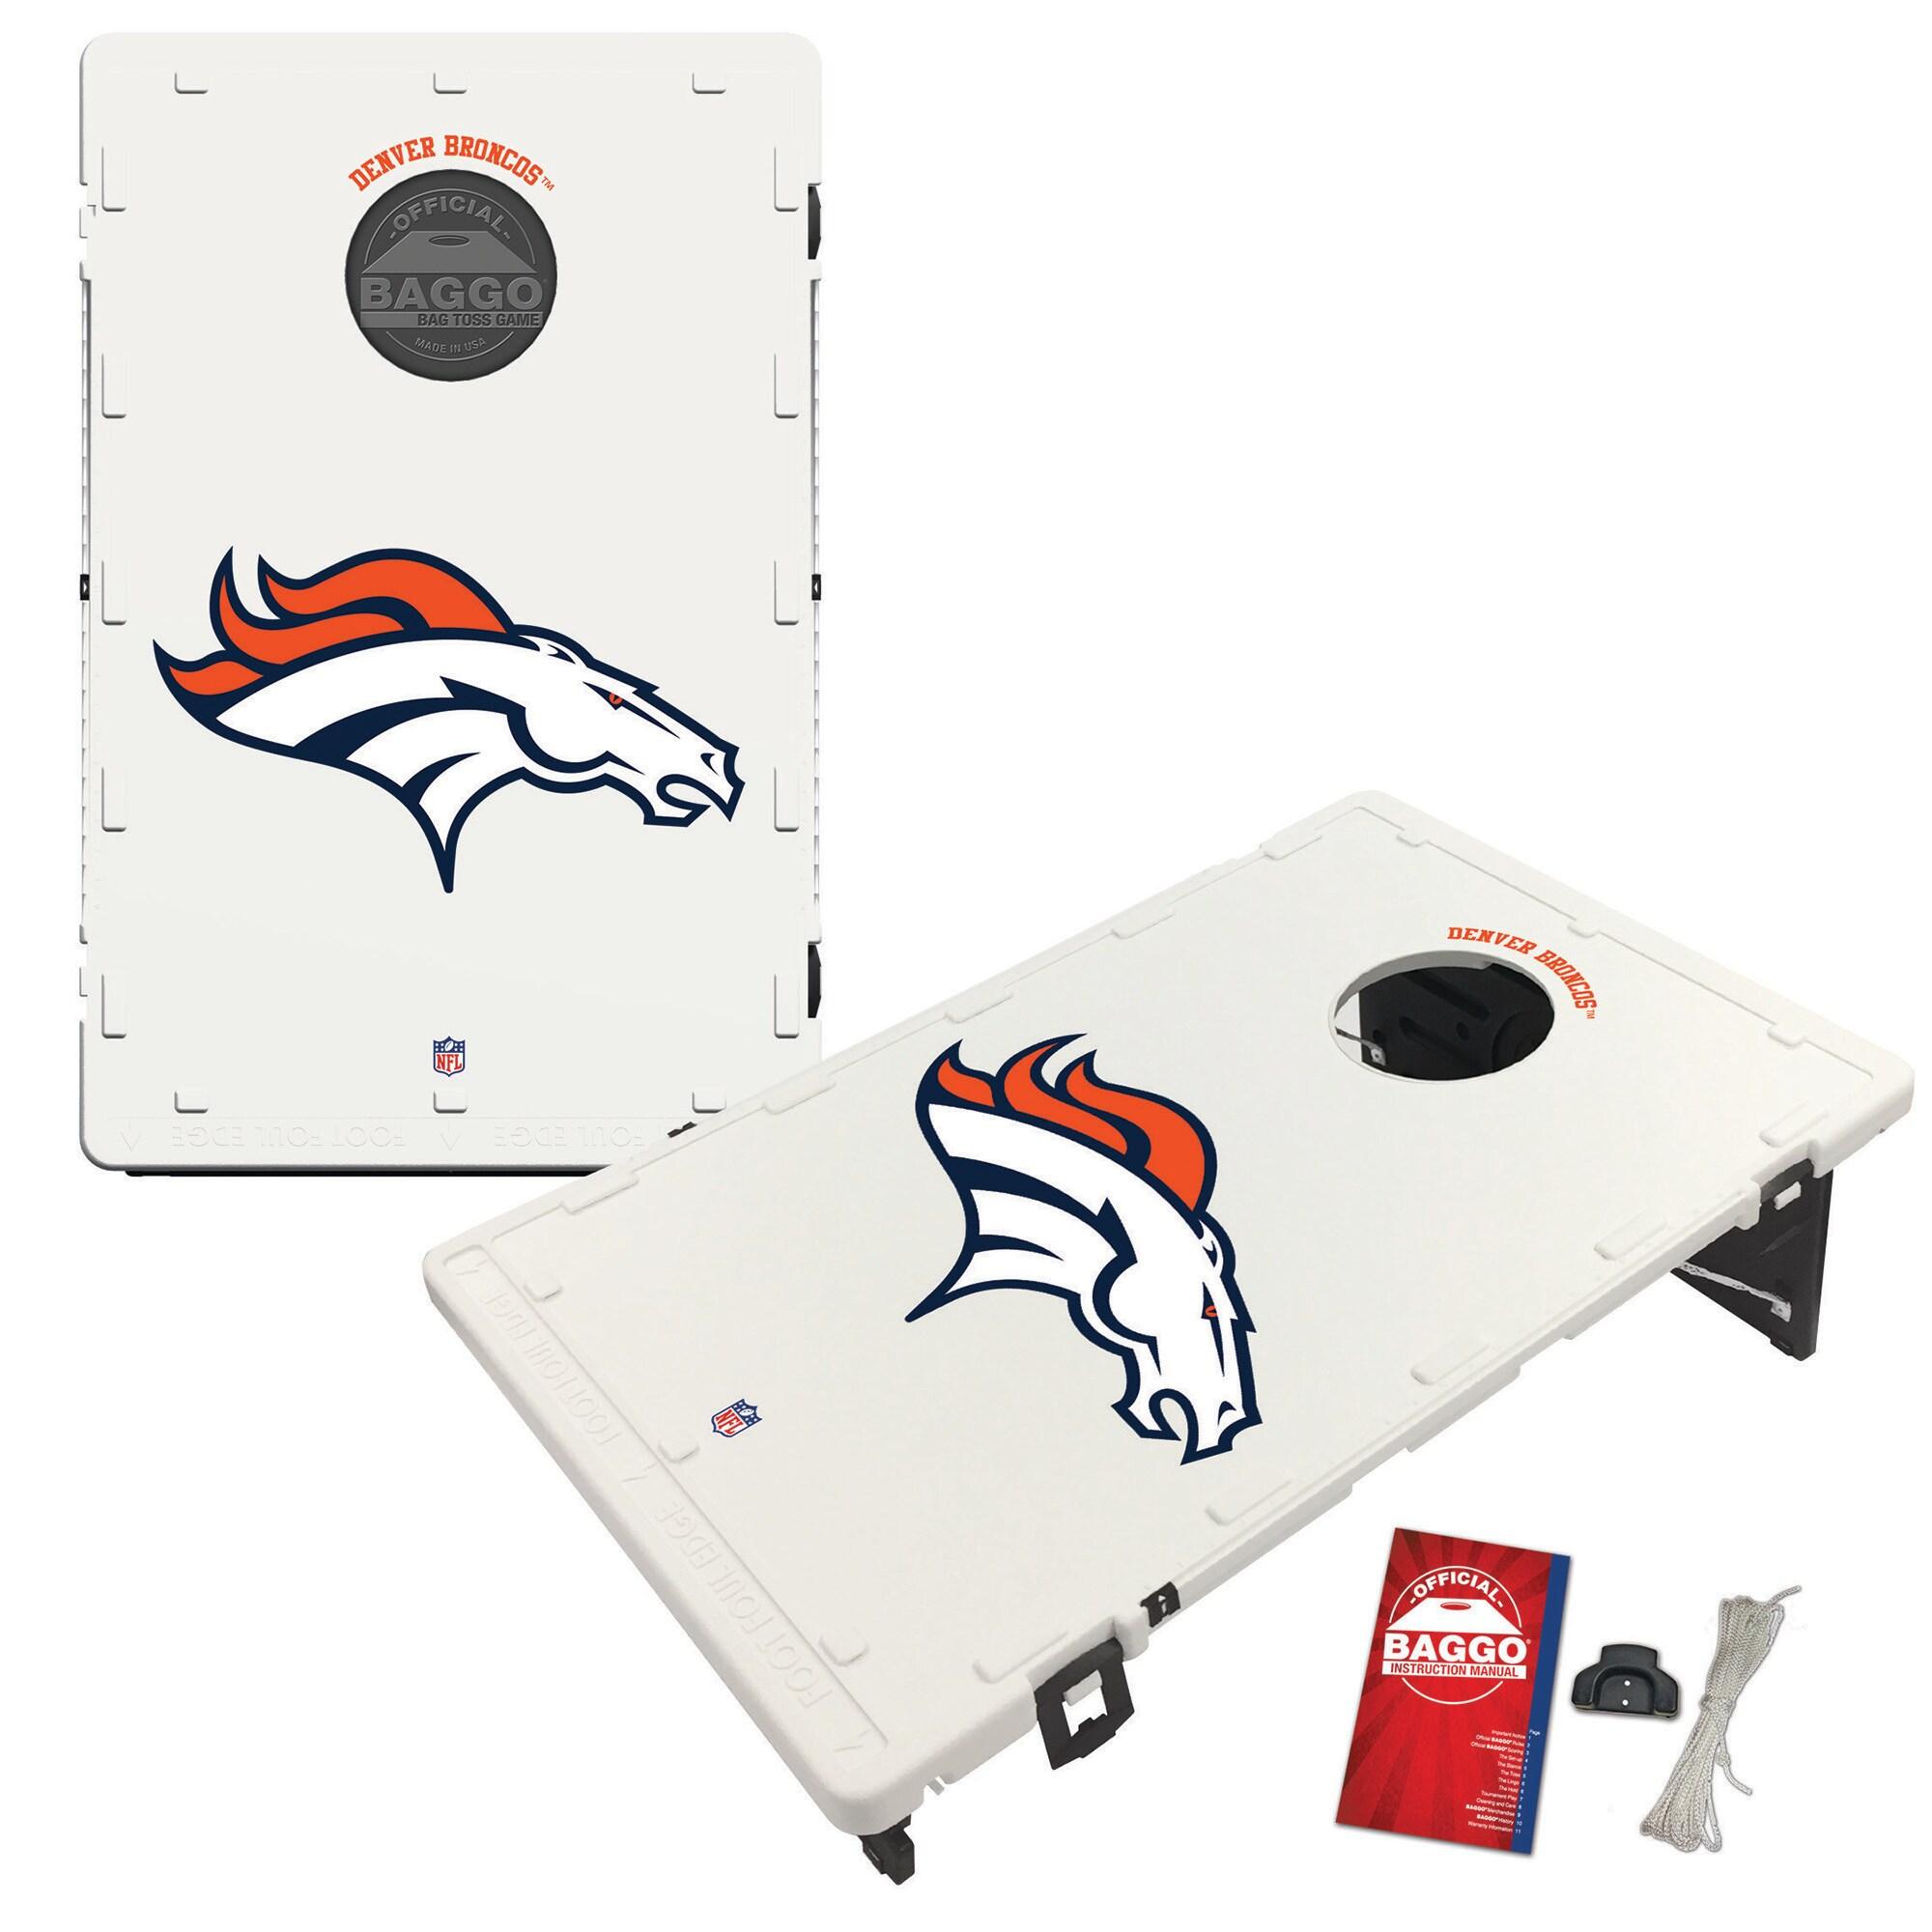 Denver Broncos 2' x 3' Classic Design BAGGO Cornhole Board Tailgate Toss Set